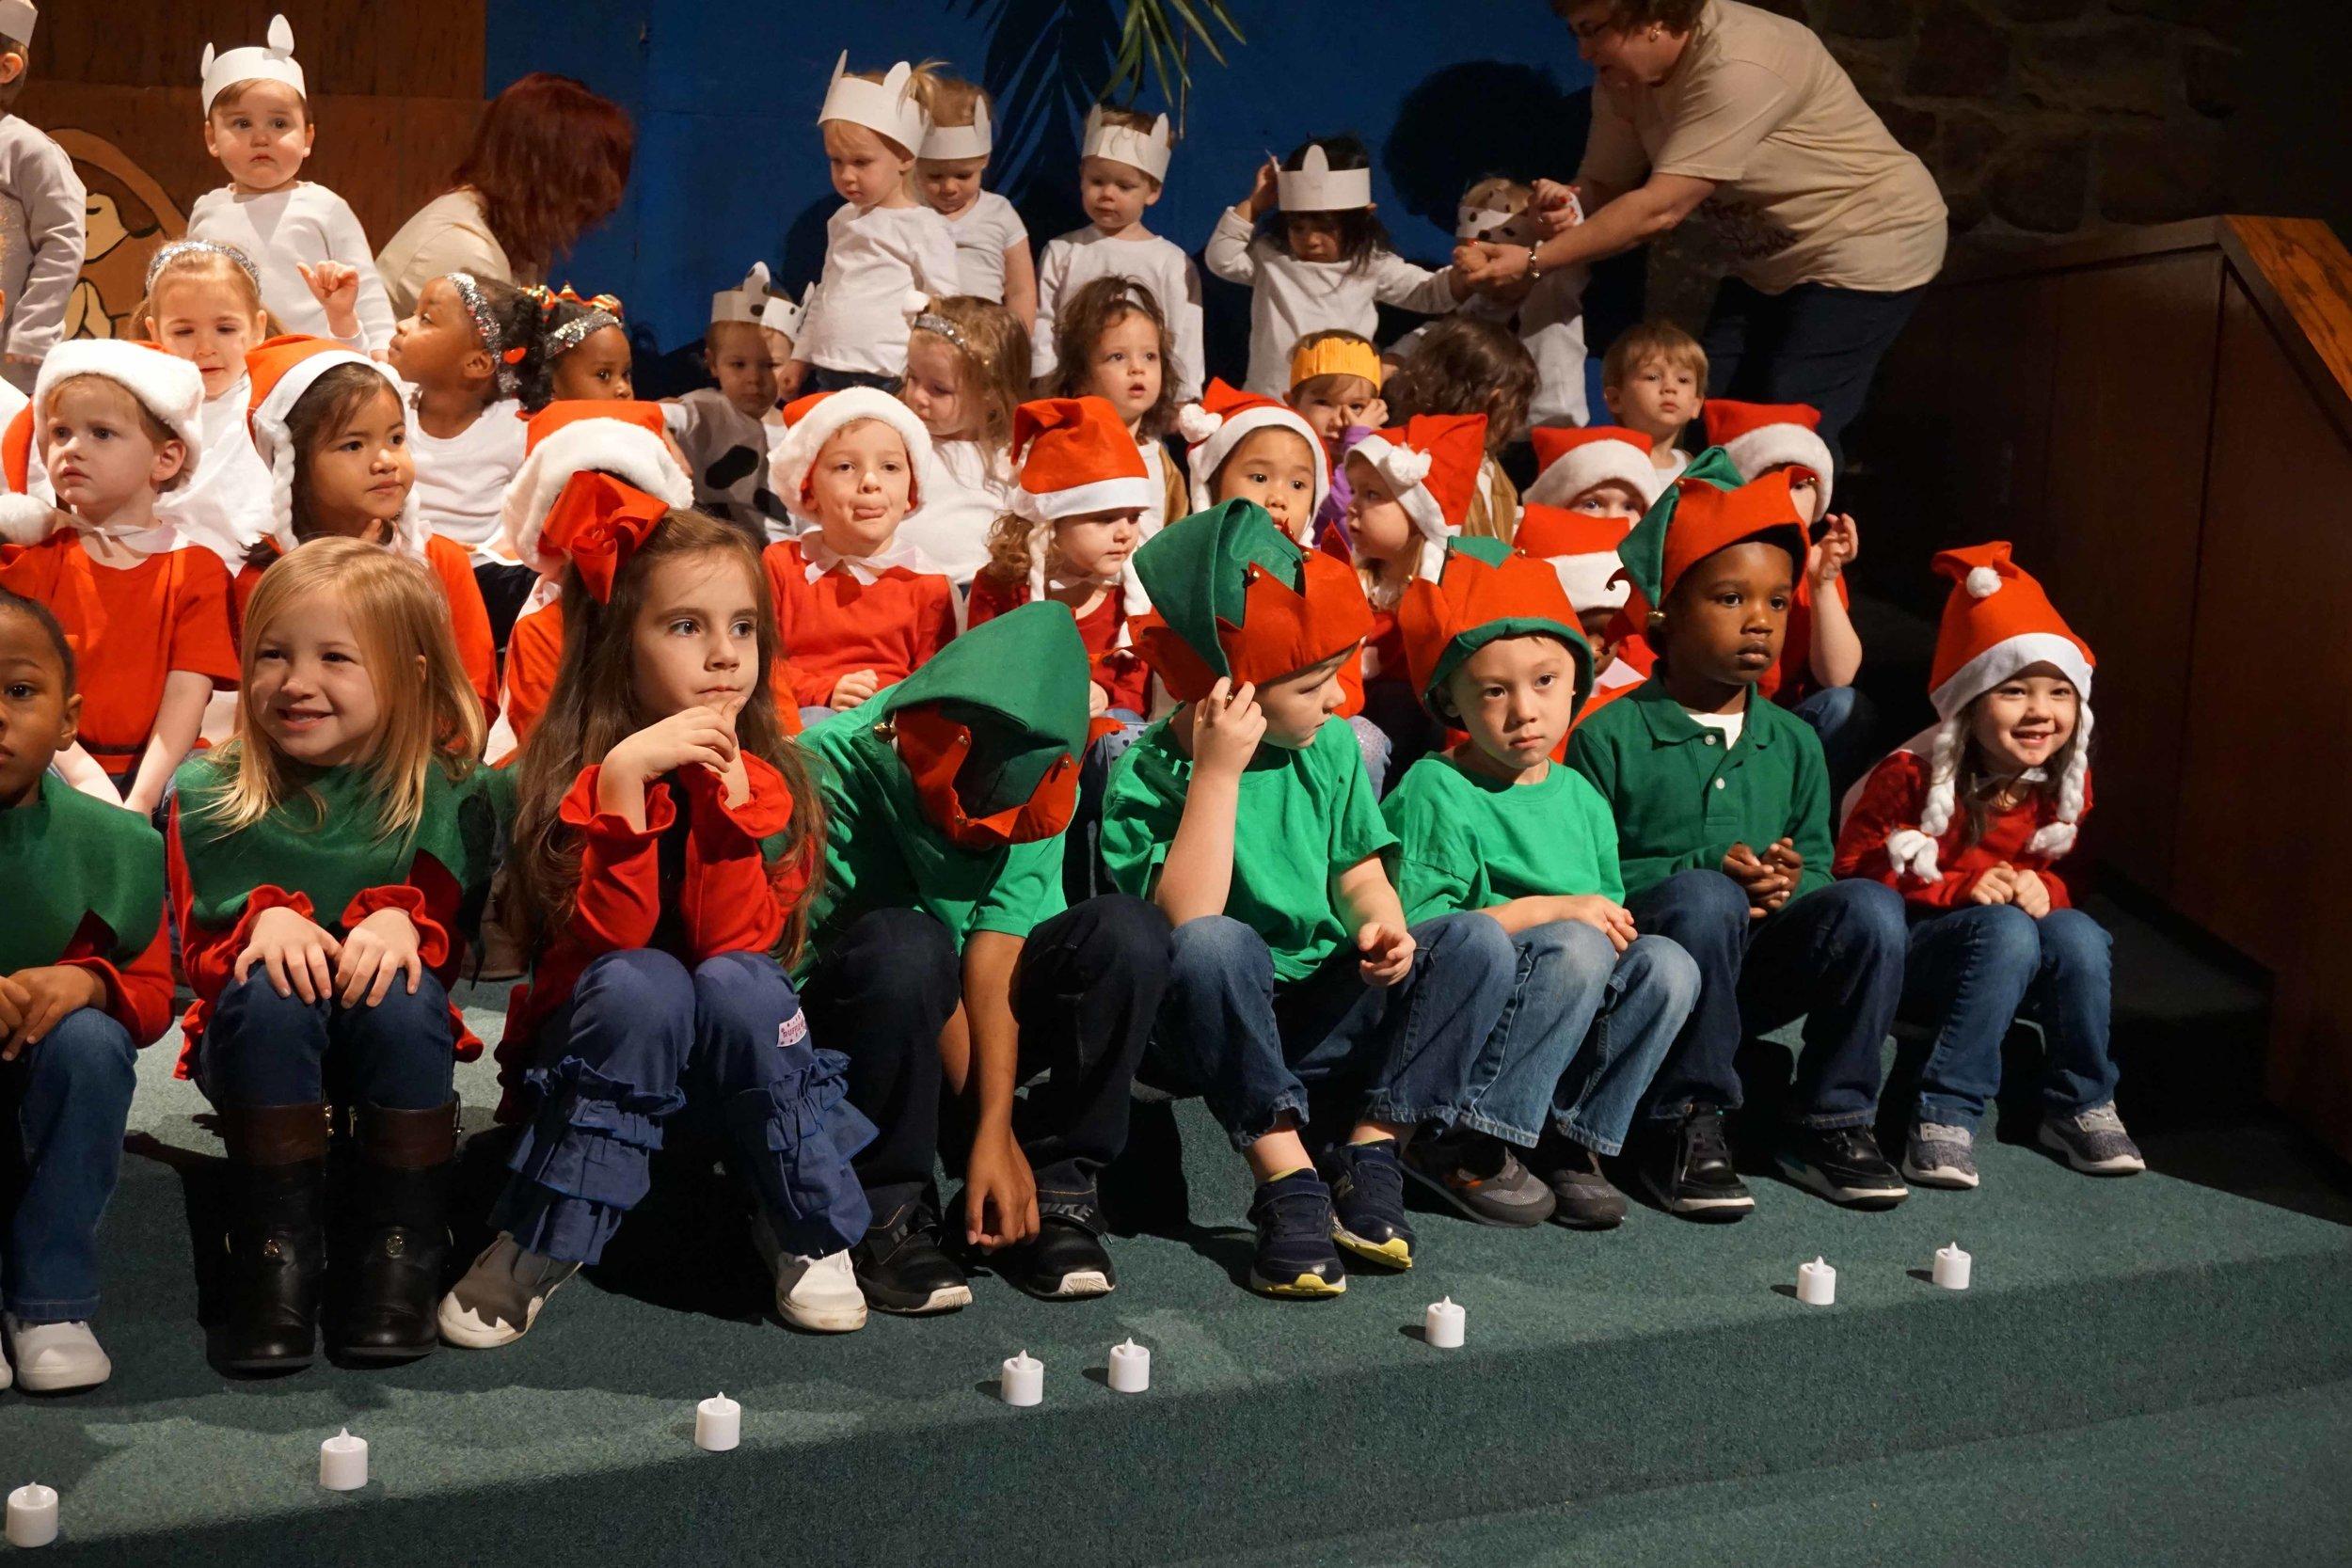 Dec13 WSLH ChristmasProgramTinyTravelers&HappyCamp64.jpg